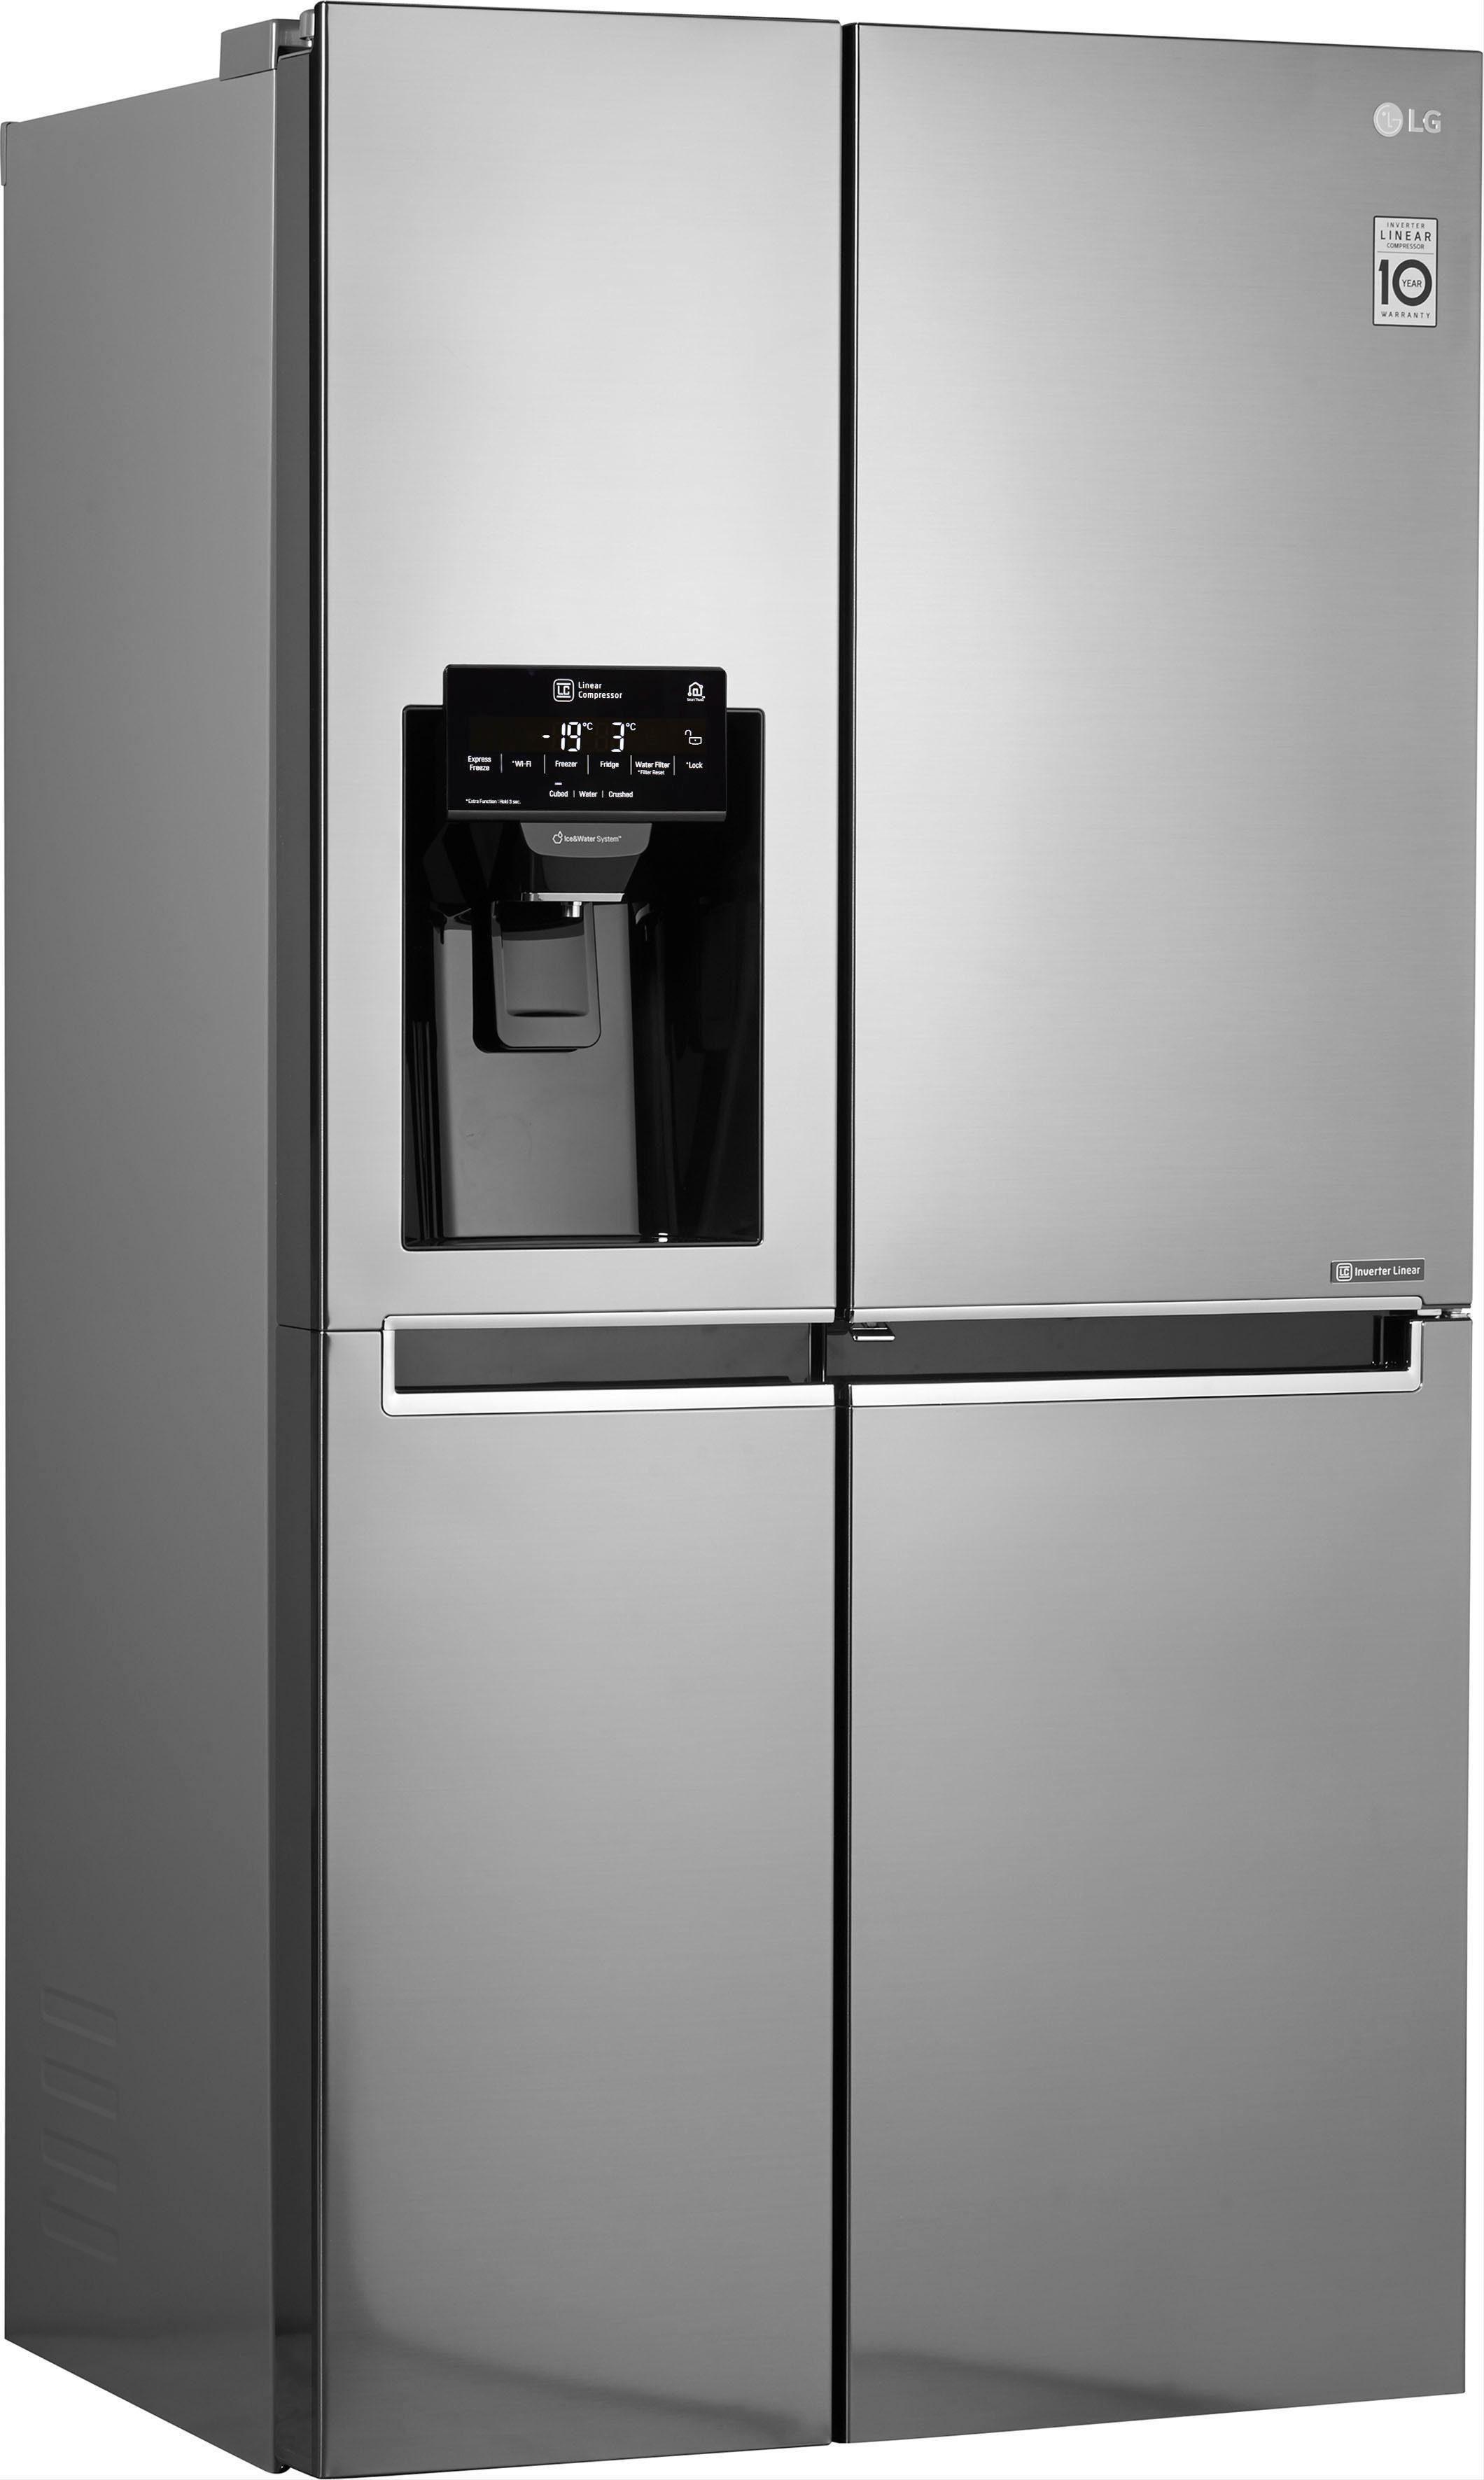 LG Side-by-Side GSJ 760 PZUZ, 179 cm hoch, 91,2 cm breit